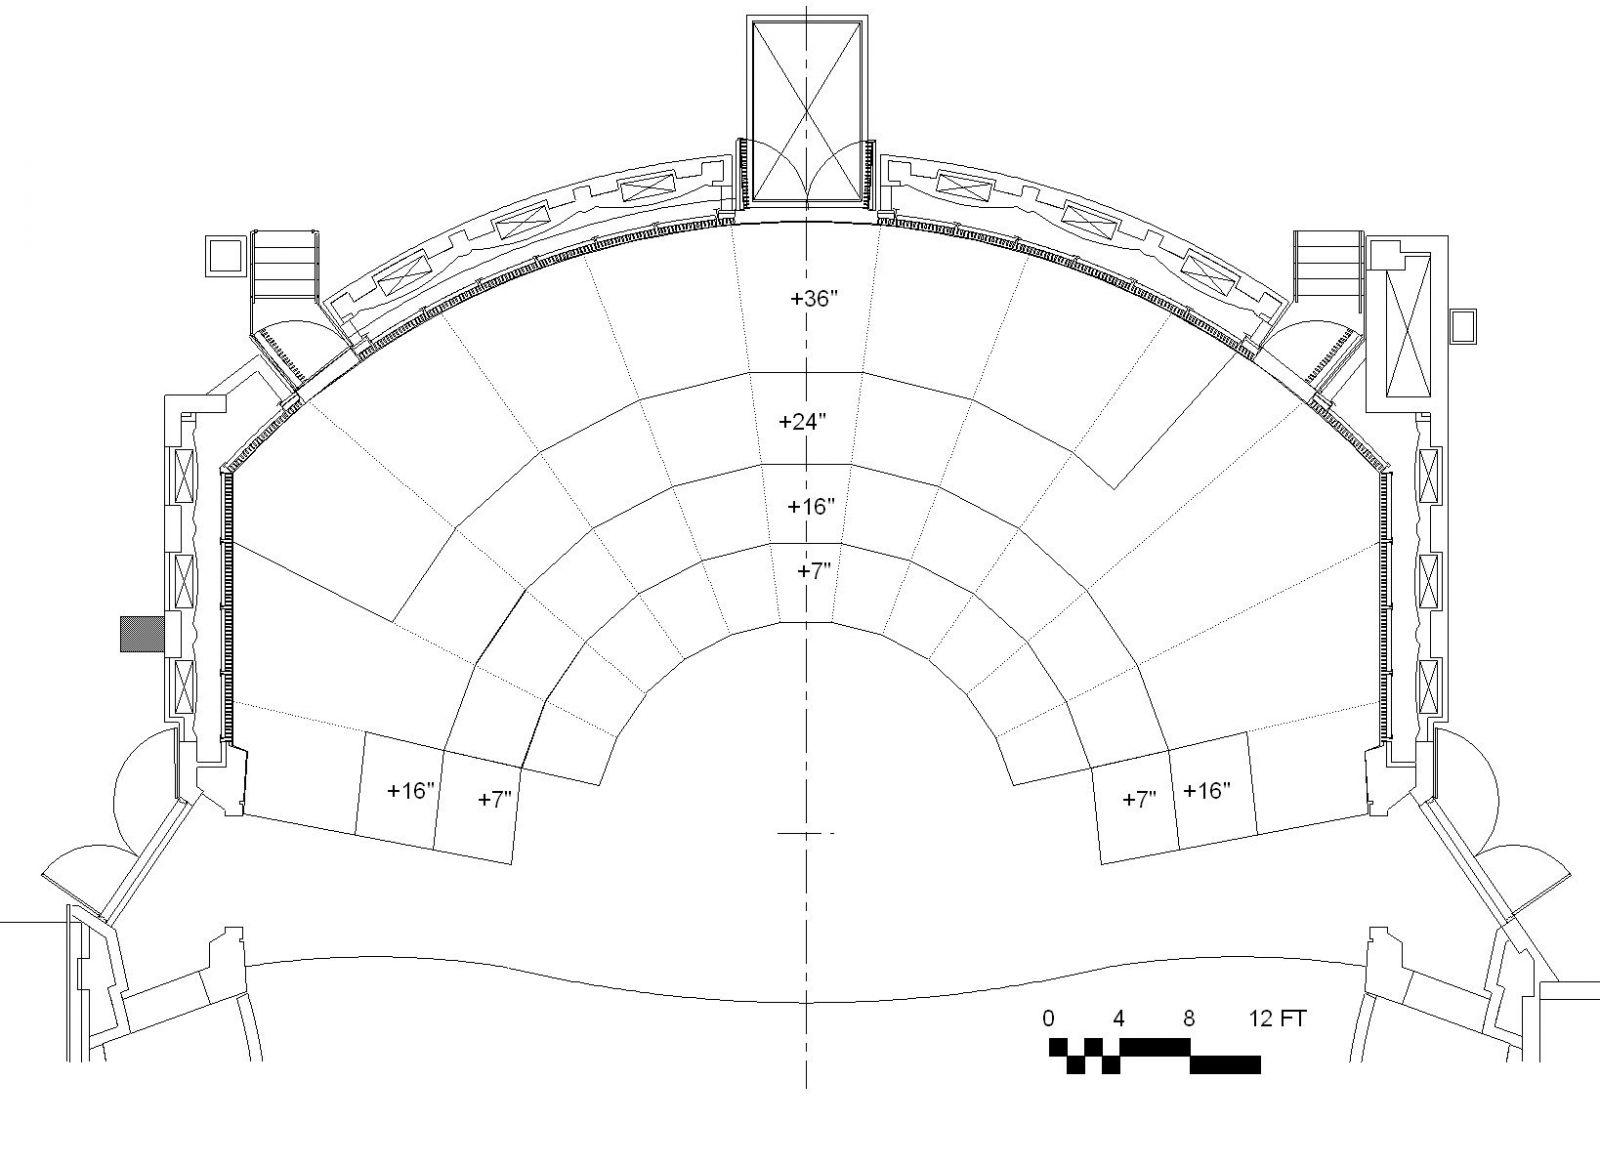 Ground Floor Plans Dekelboum Concert Hall Technical Specifications The